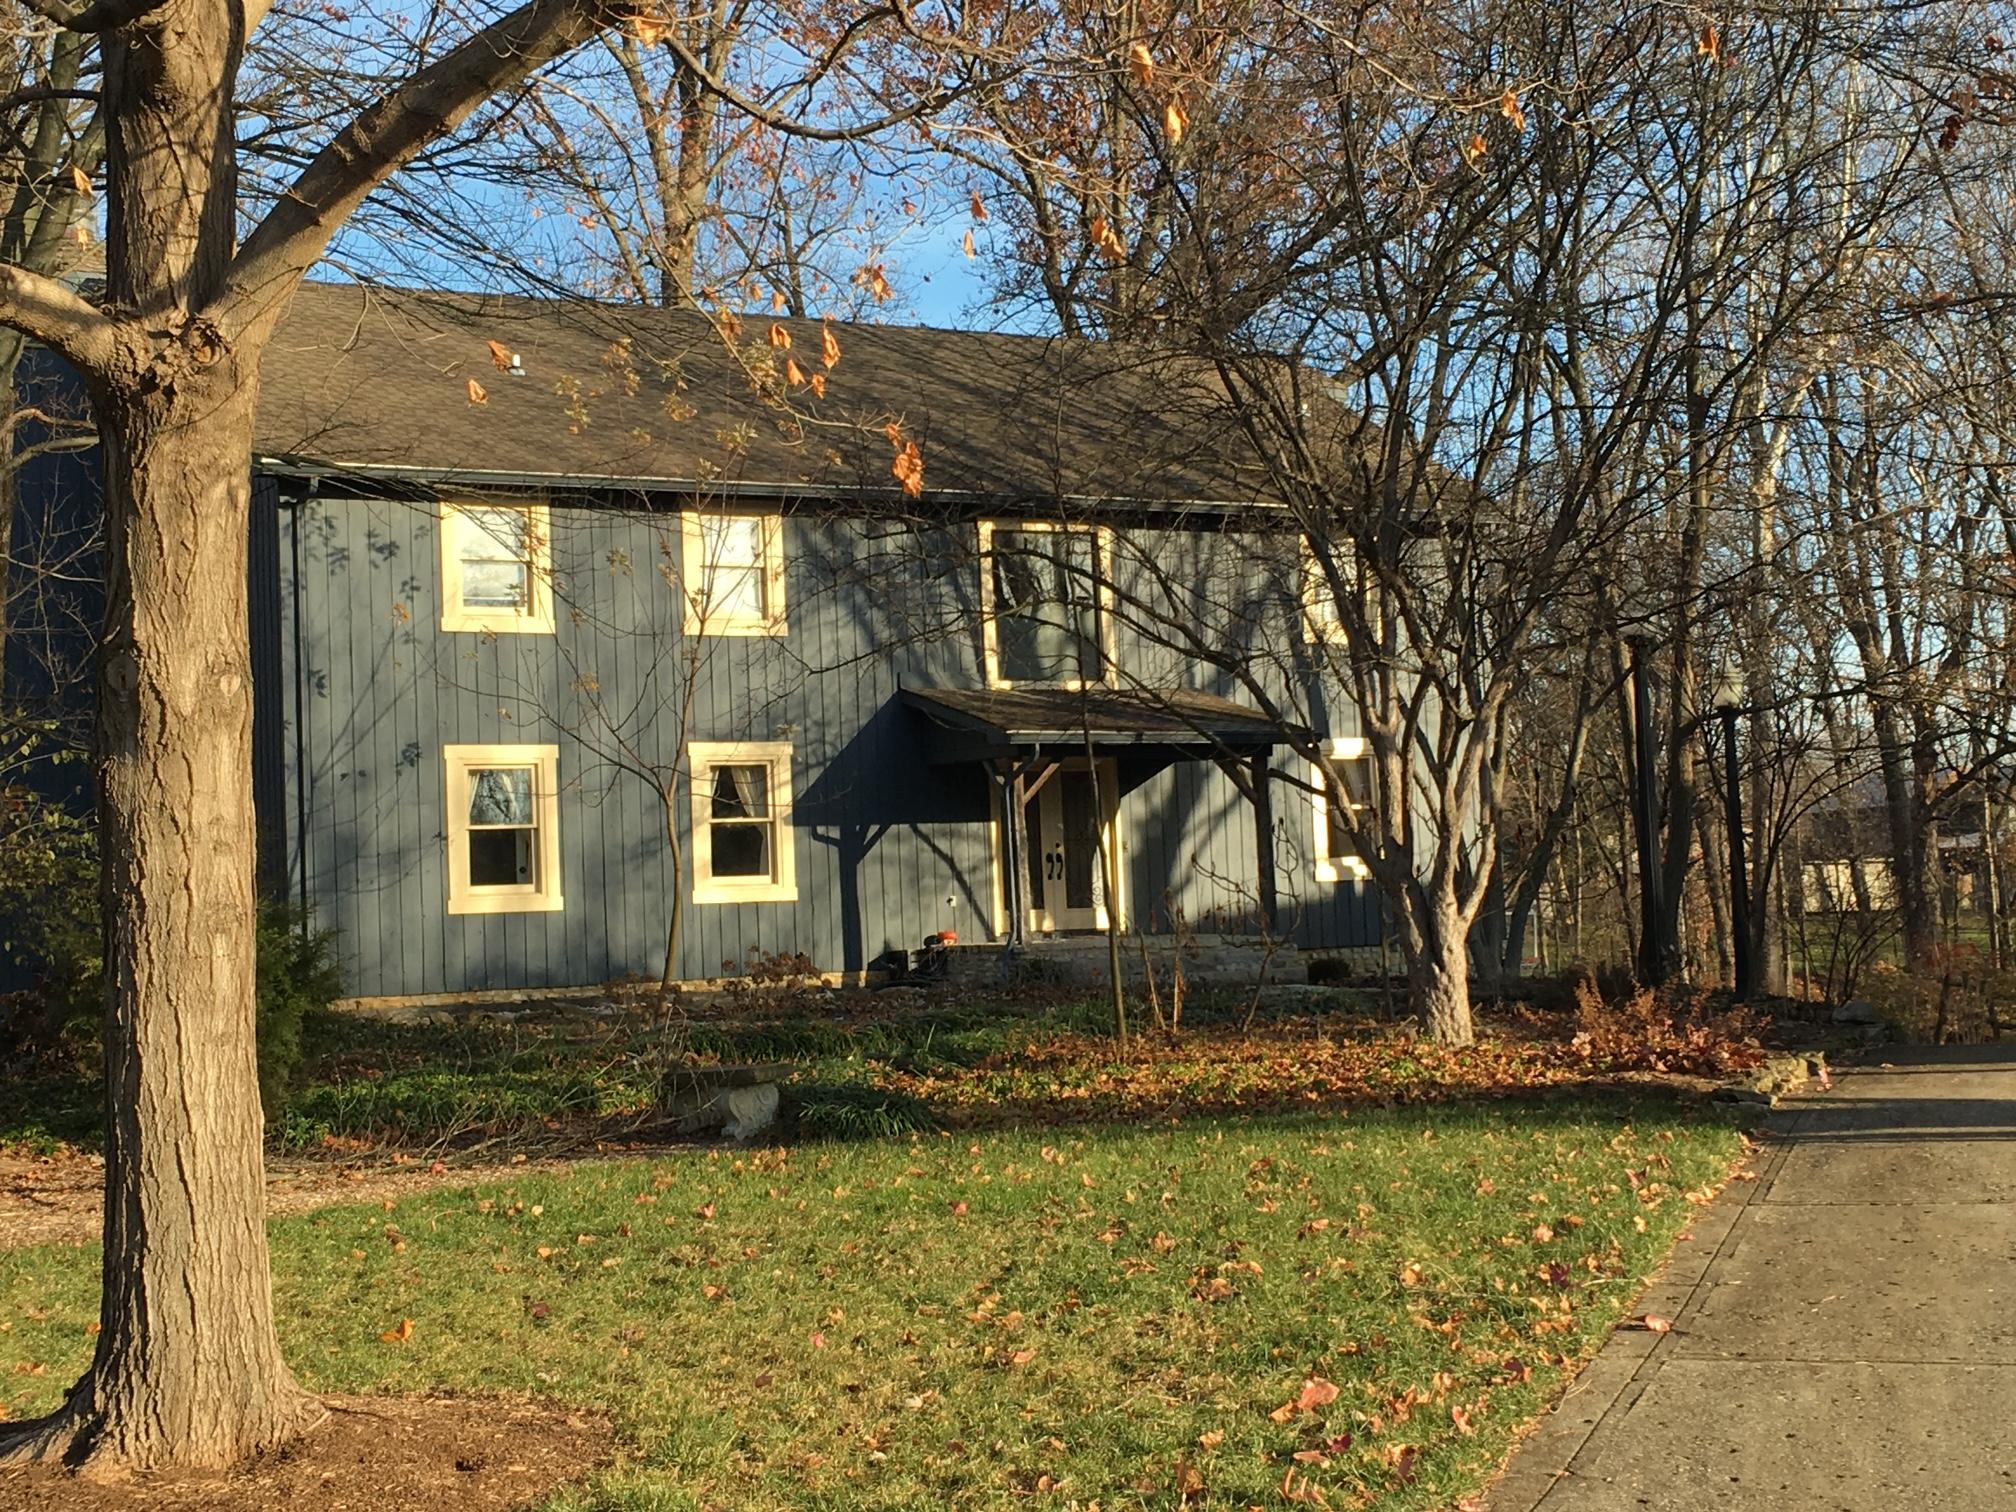 Amanda's childhood home